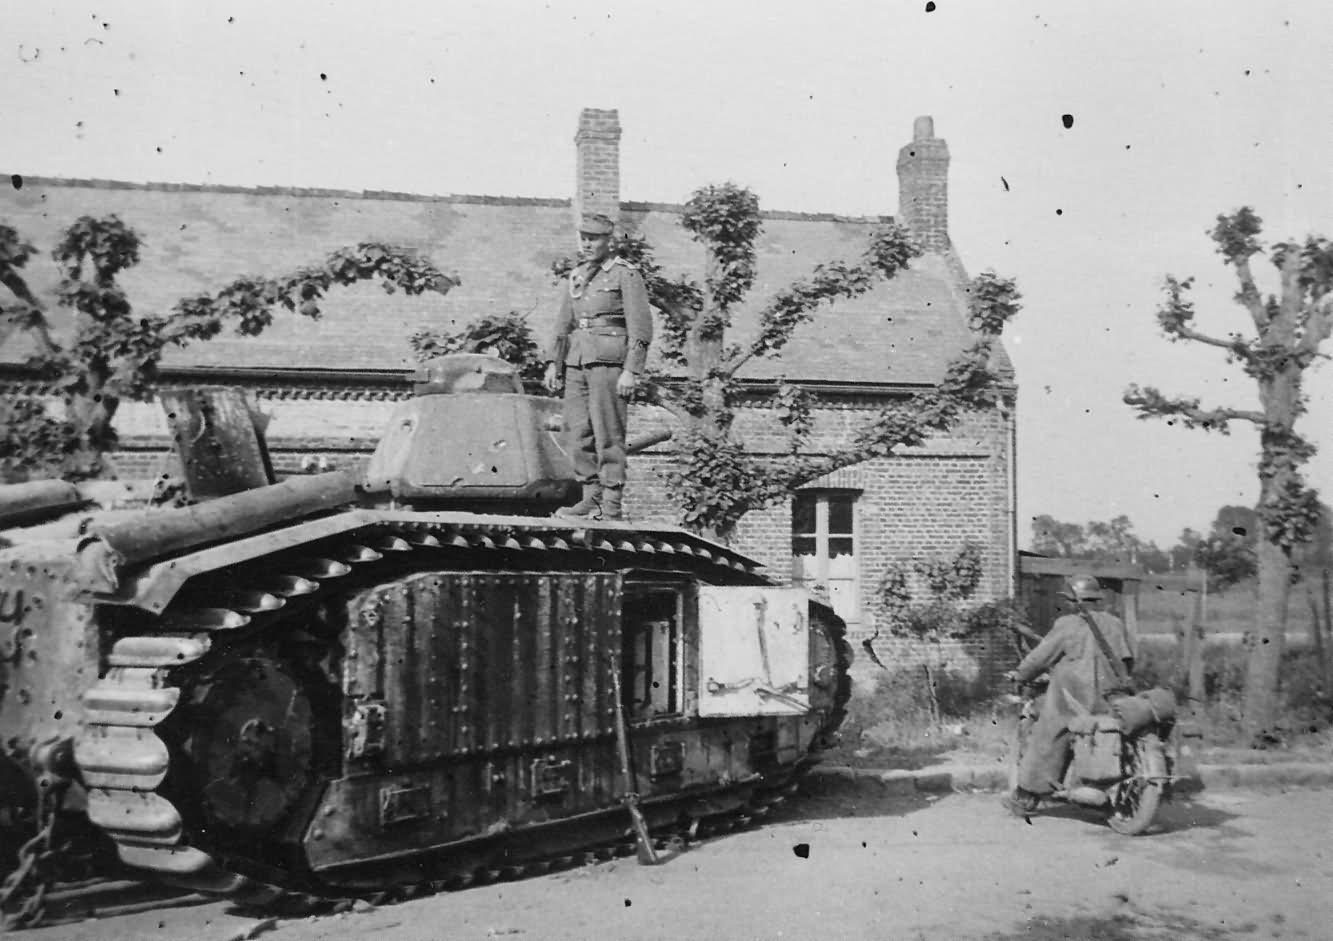 German soldier posing atop a Char B1 bis tank